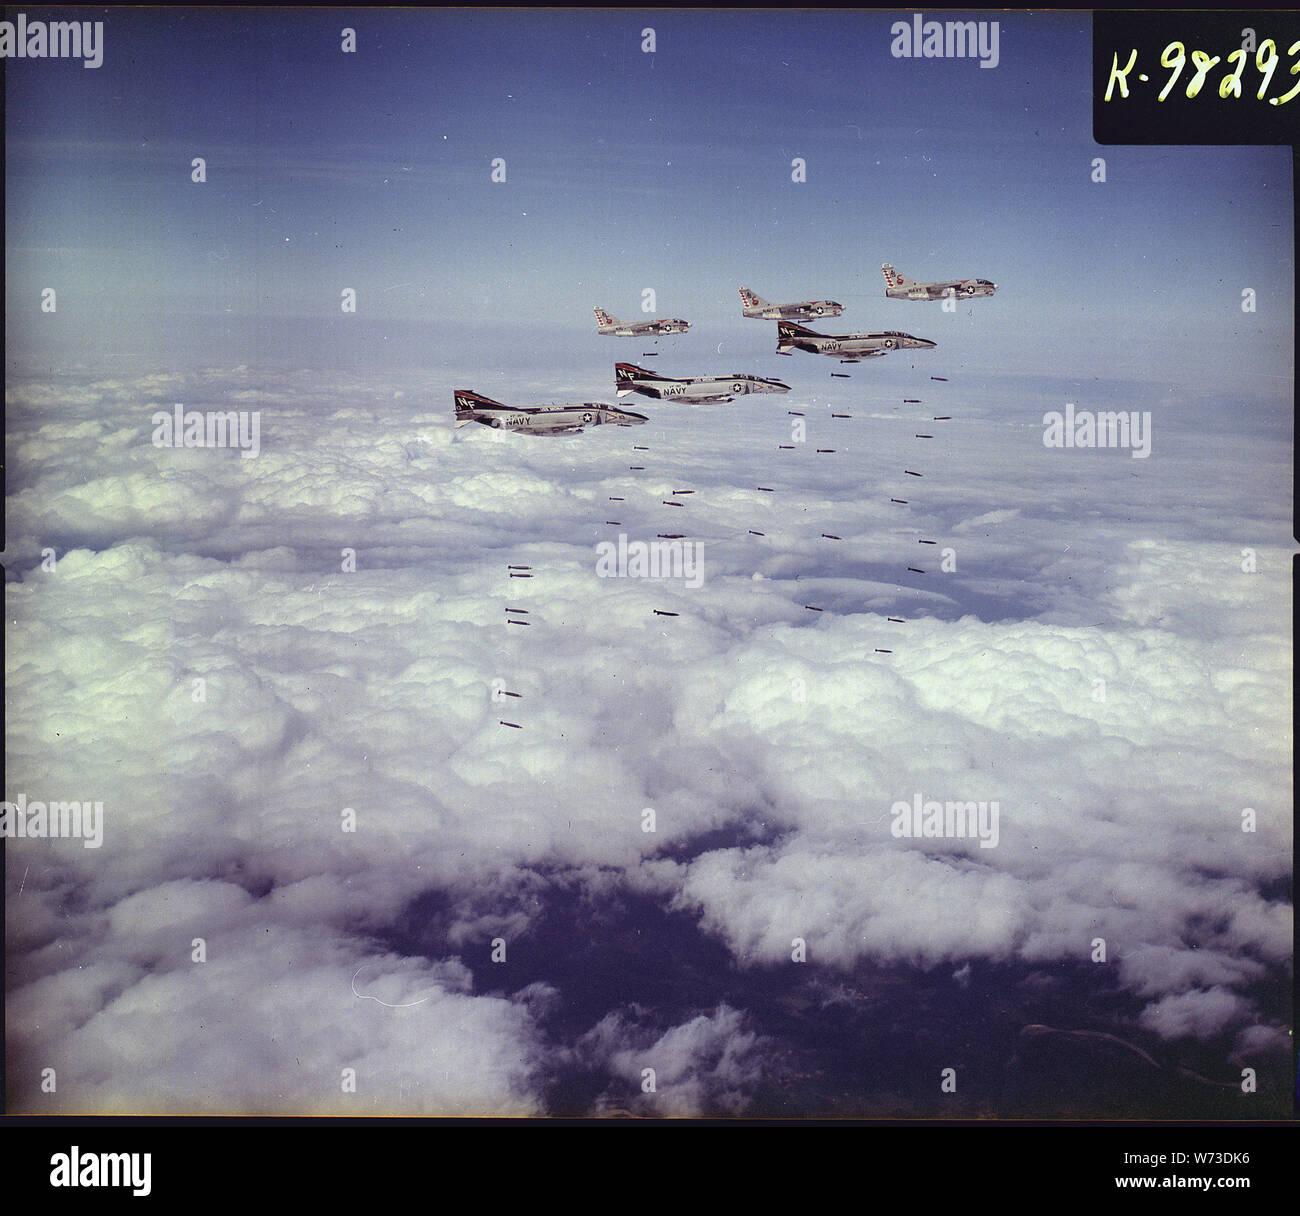 Vietnam  Three Fighter Squadron 161 (VF-161) F-4B Phantom II